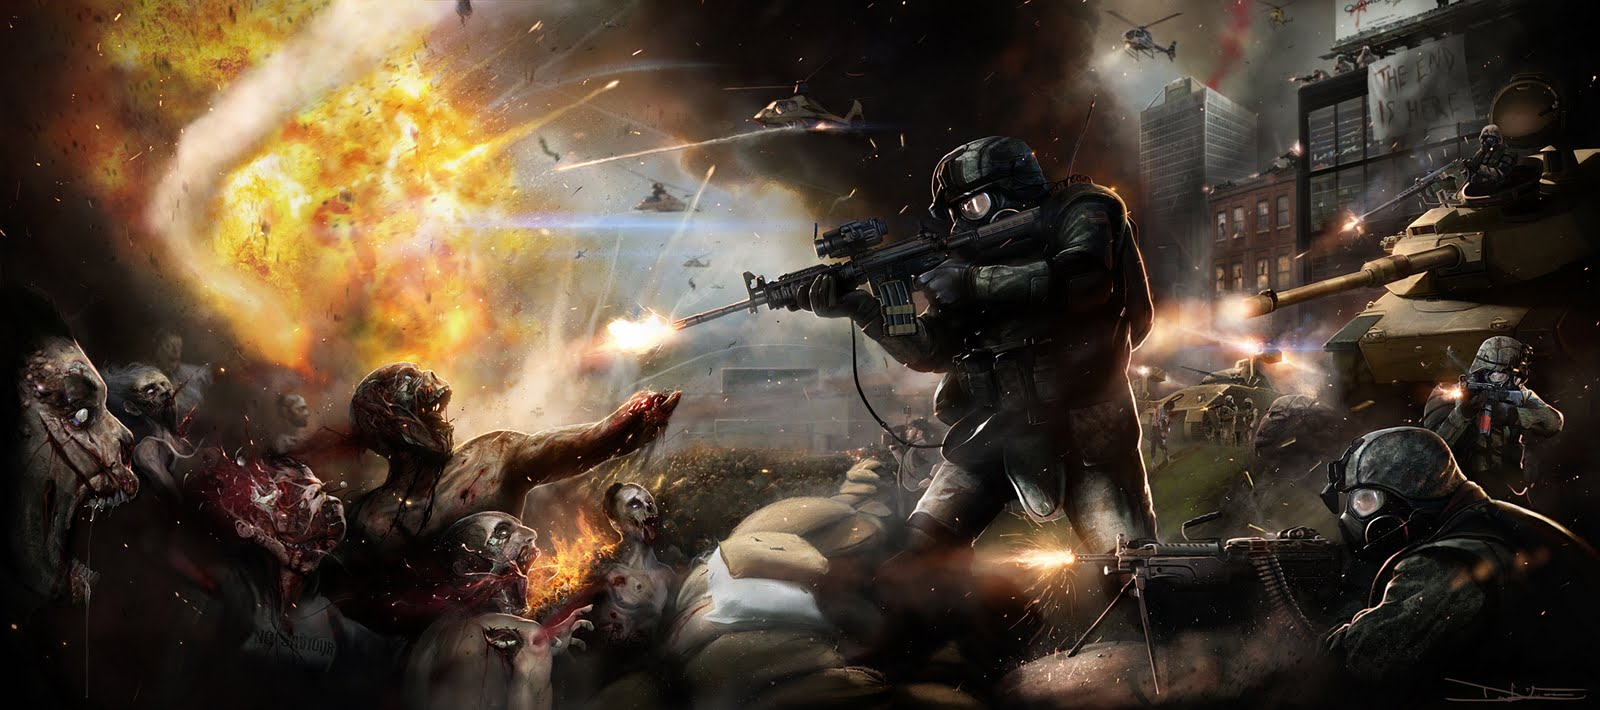 Apocalipsis zombie: la verdad jamas contada... Parte XI.